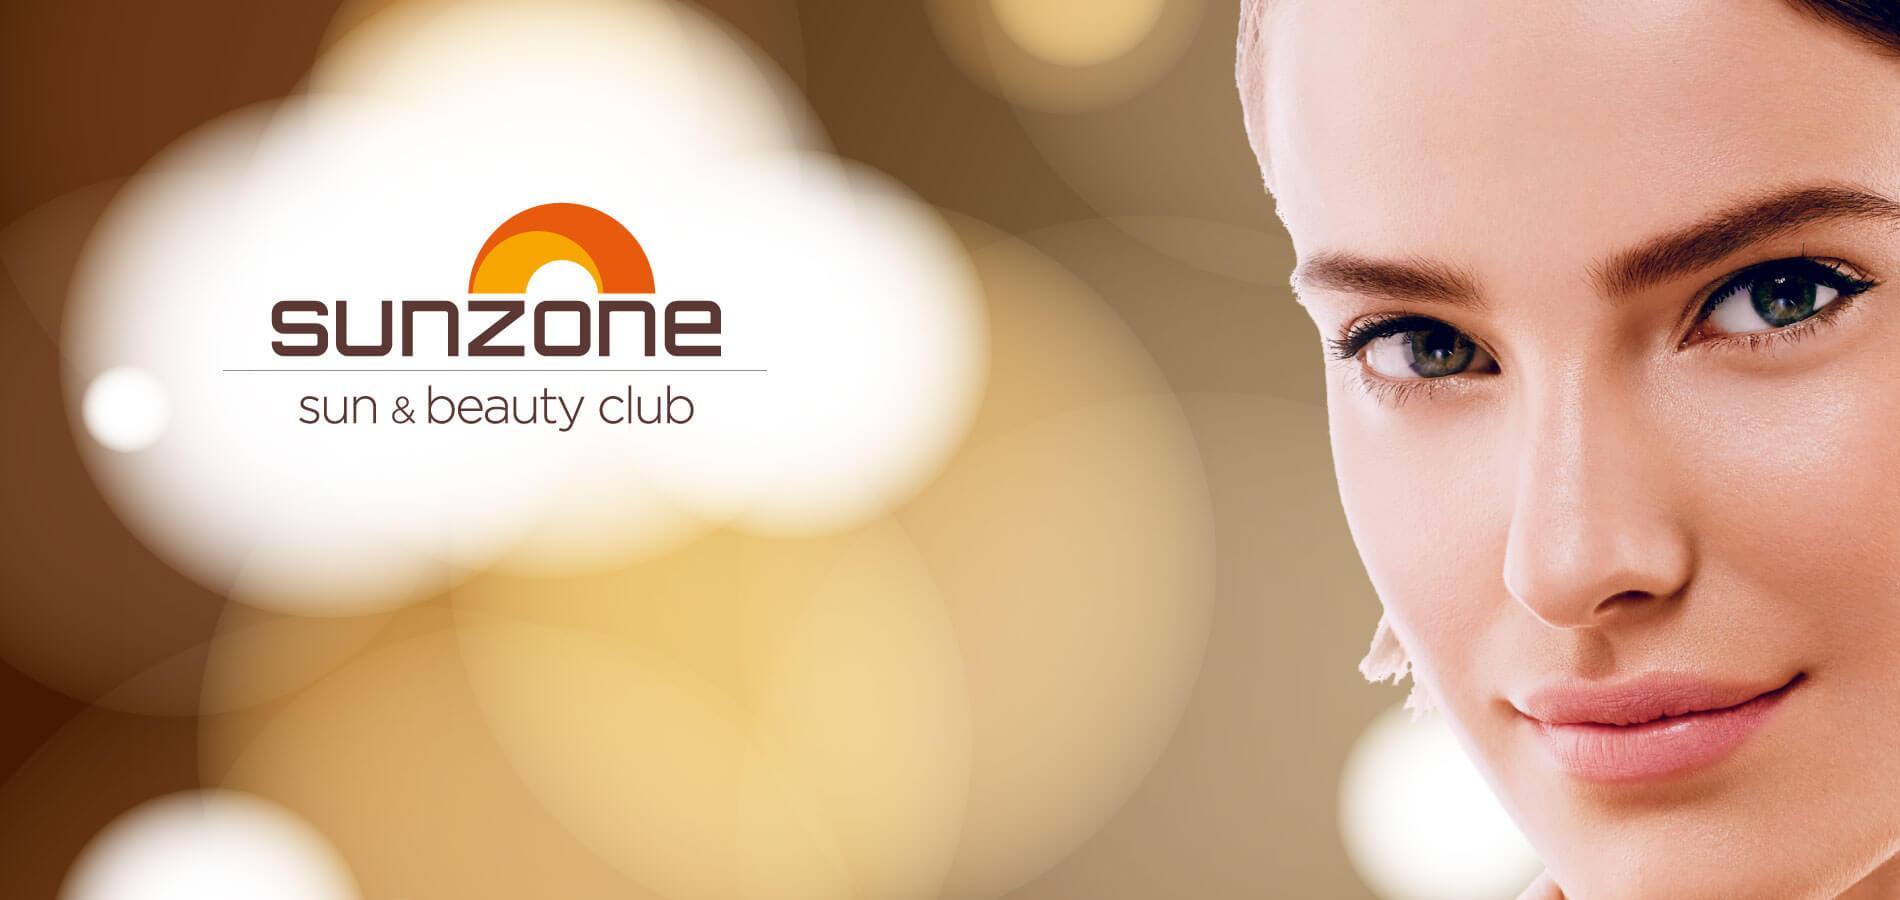 sunzone sun & beauty club